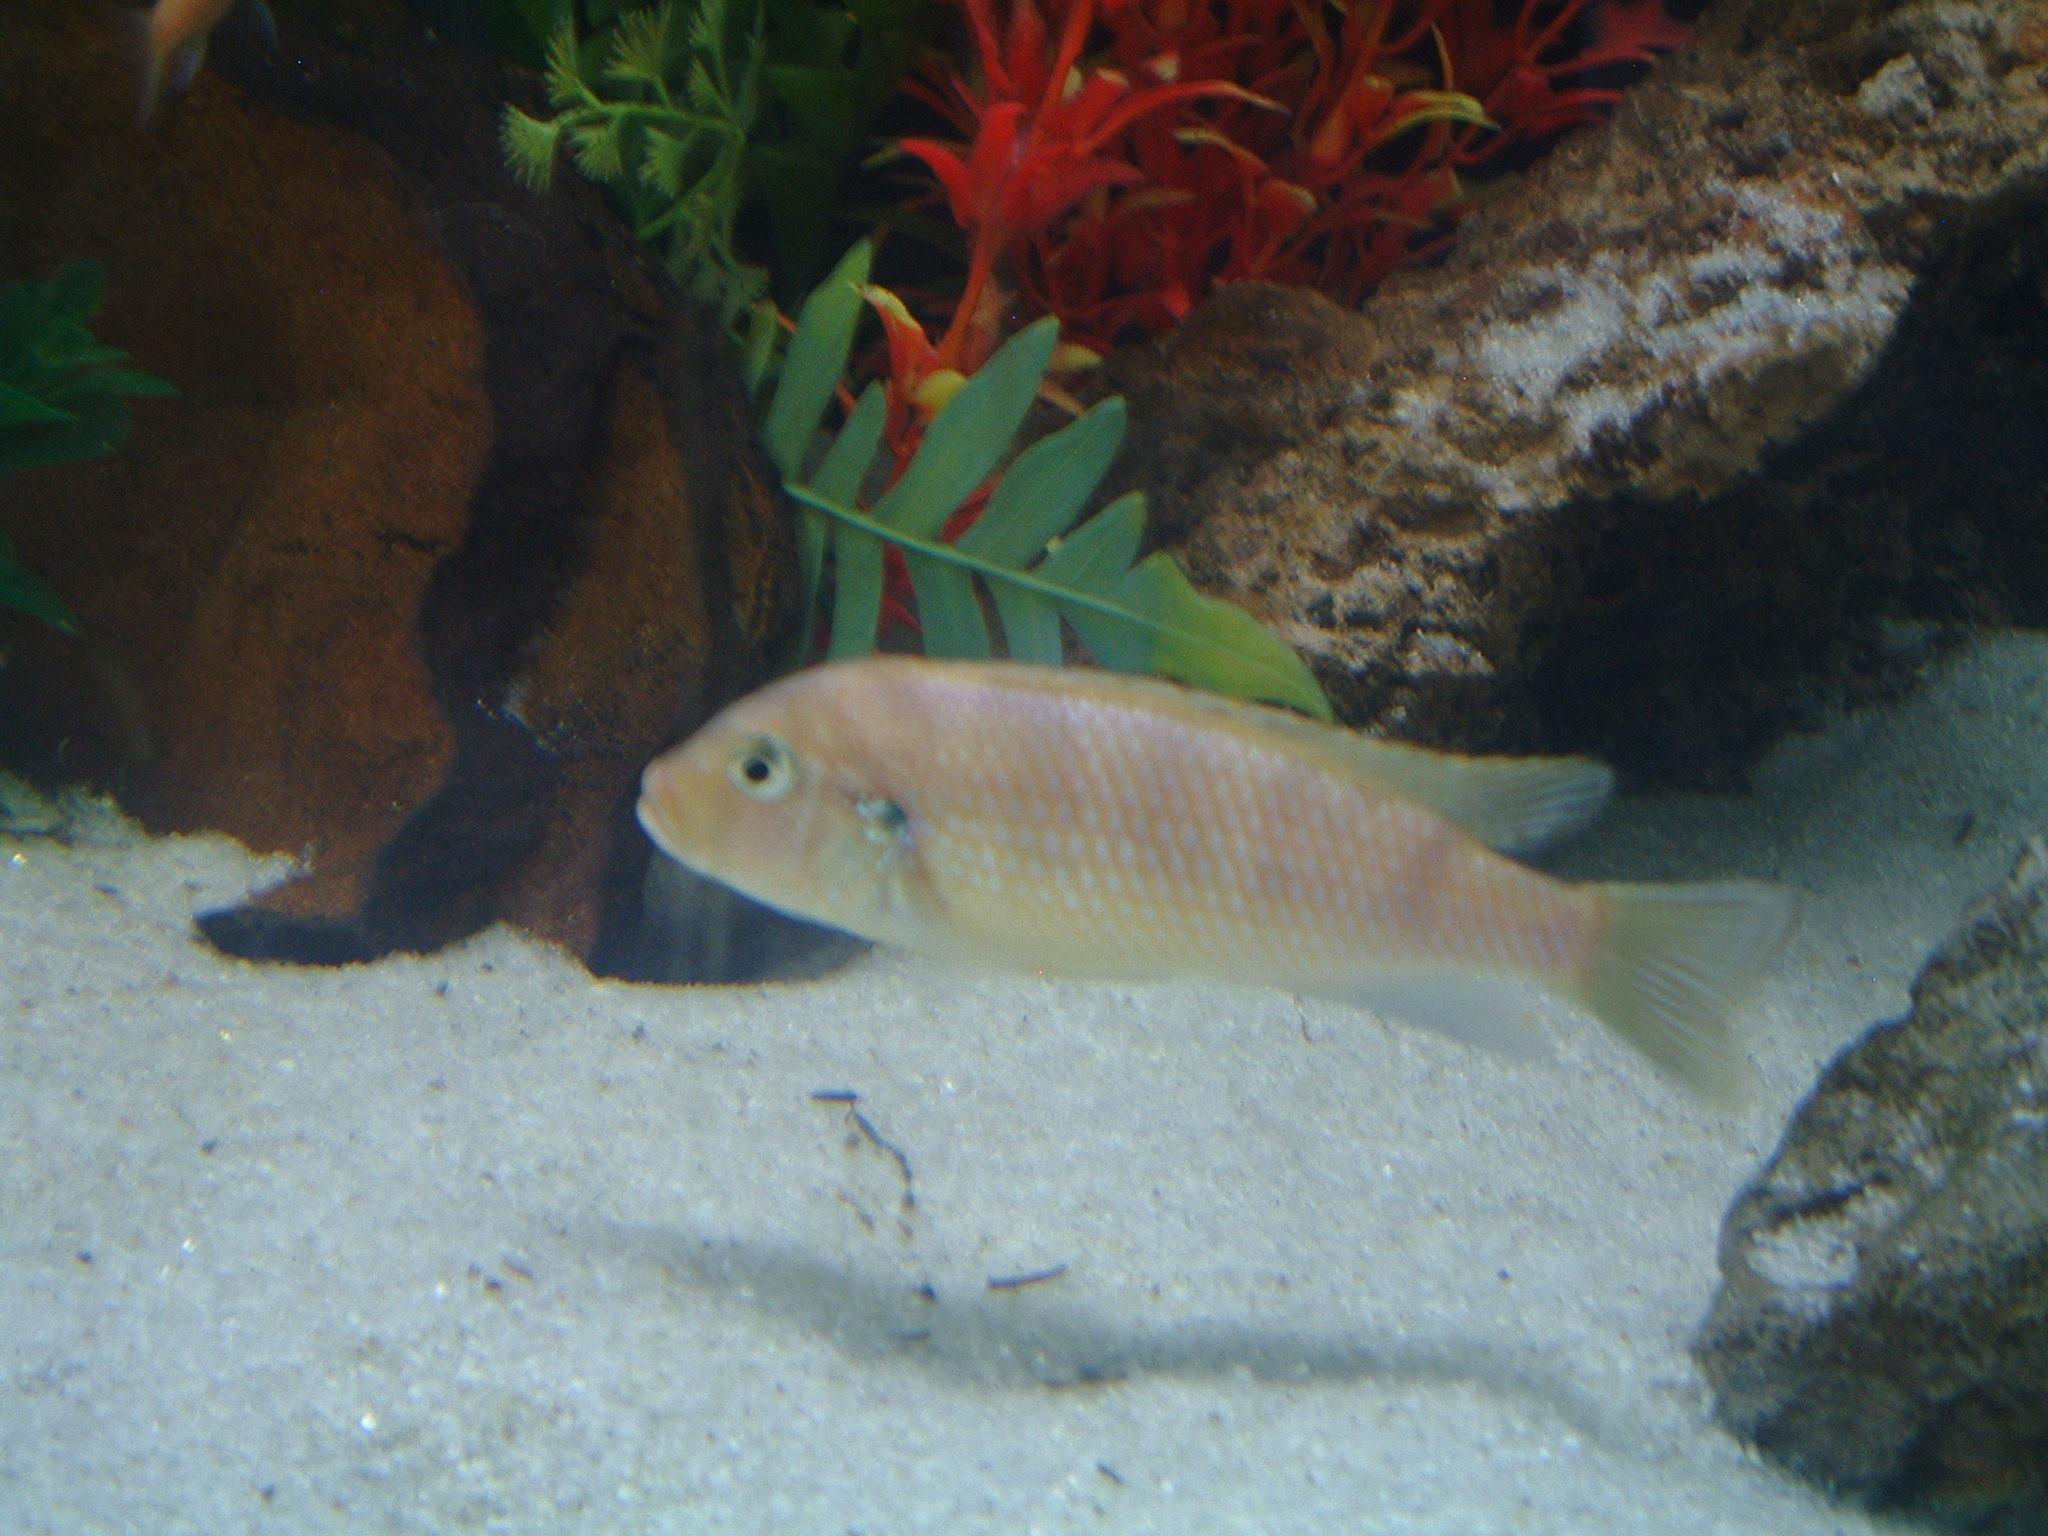 Kenyi Cichlid - Microcosm Aquarium Explorer